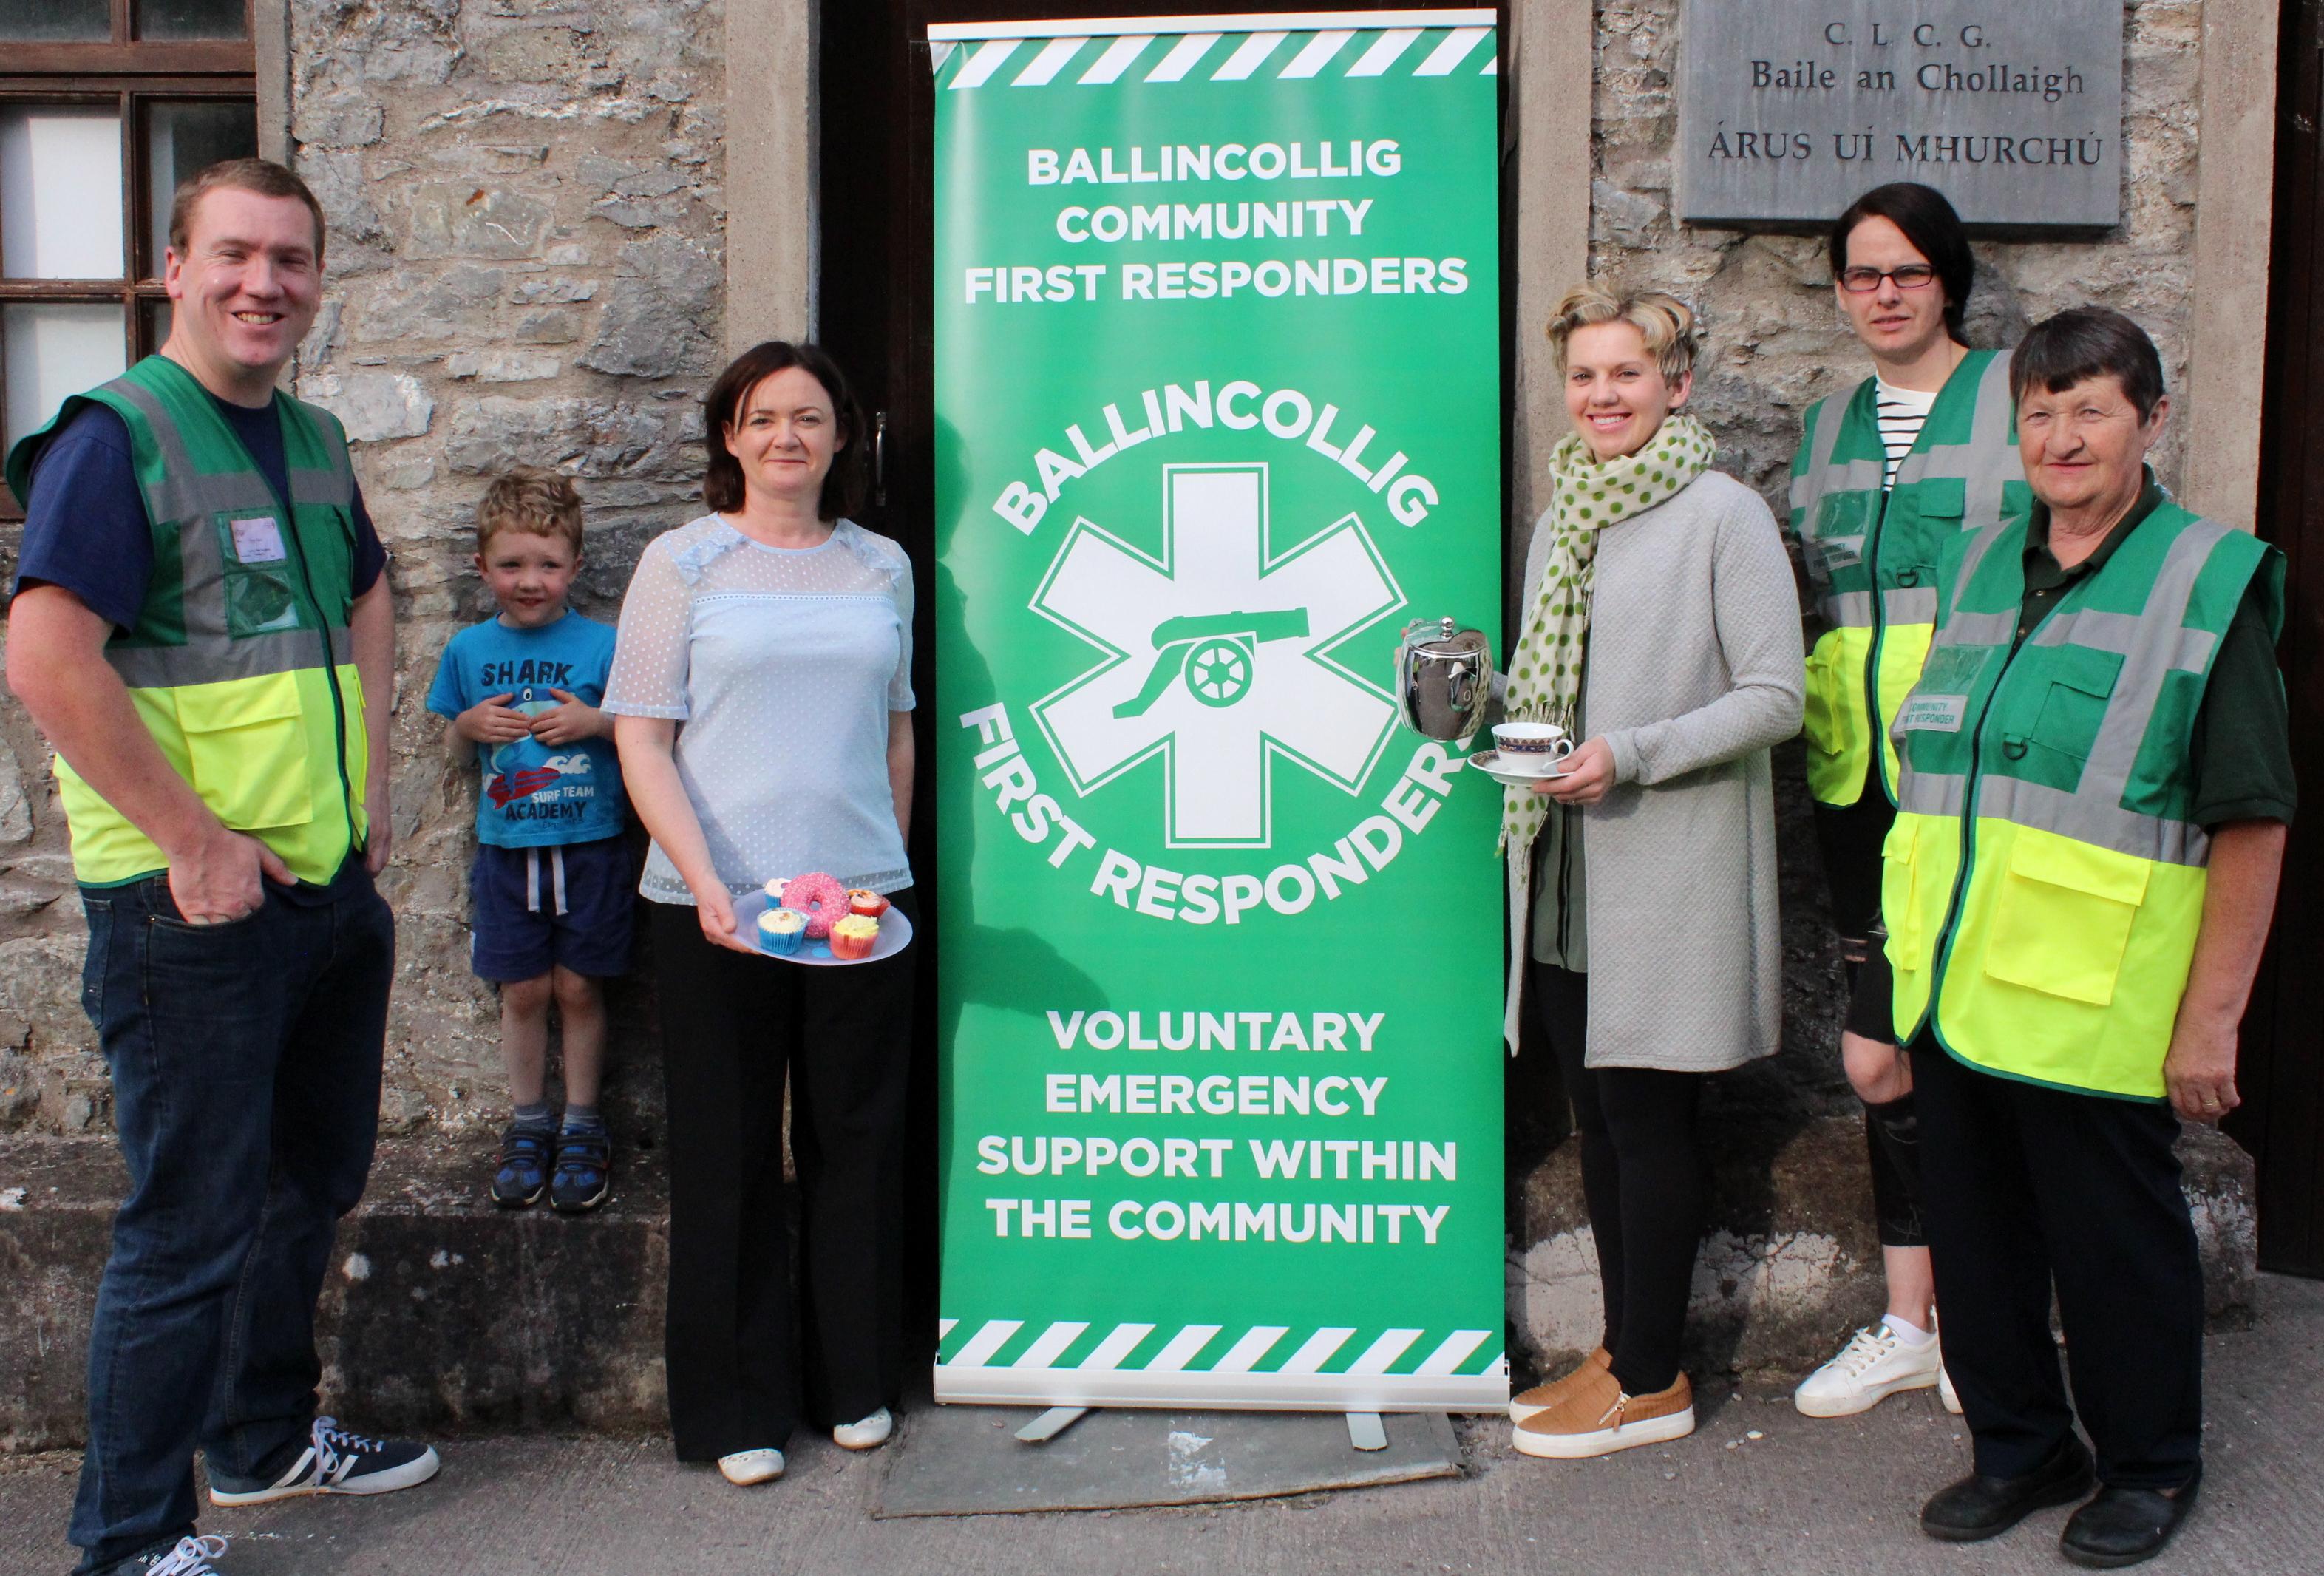 Ballincollig Community First Responders Fundraiser Photo